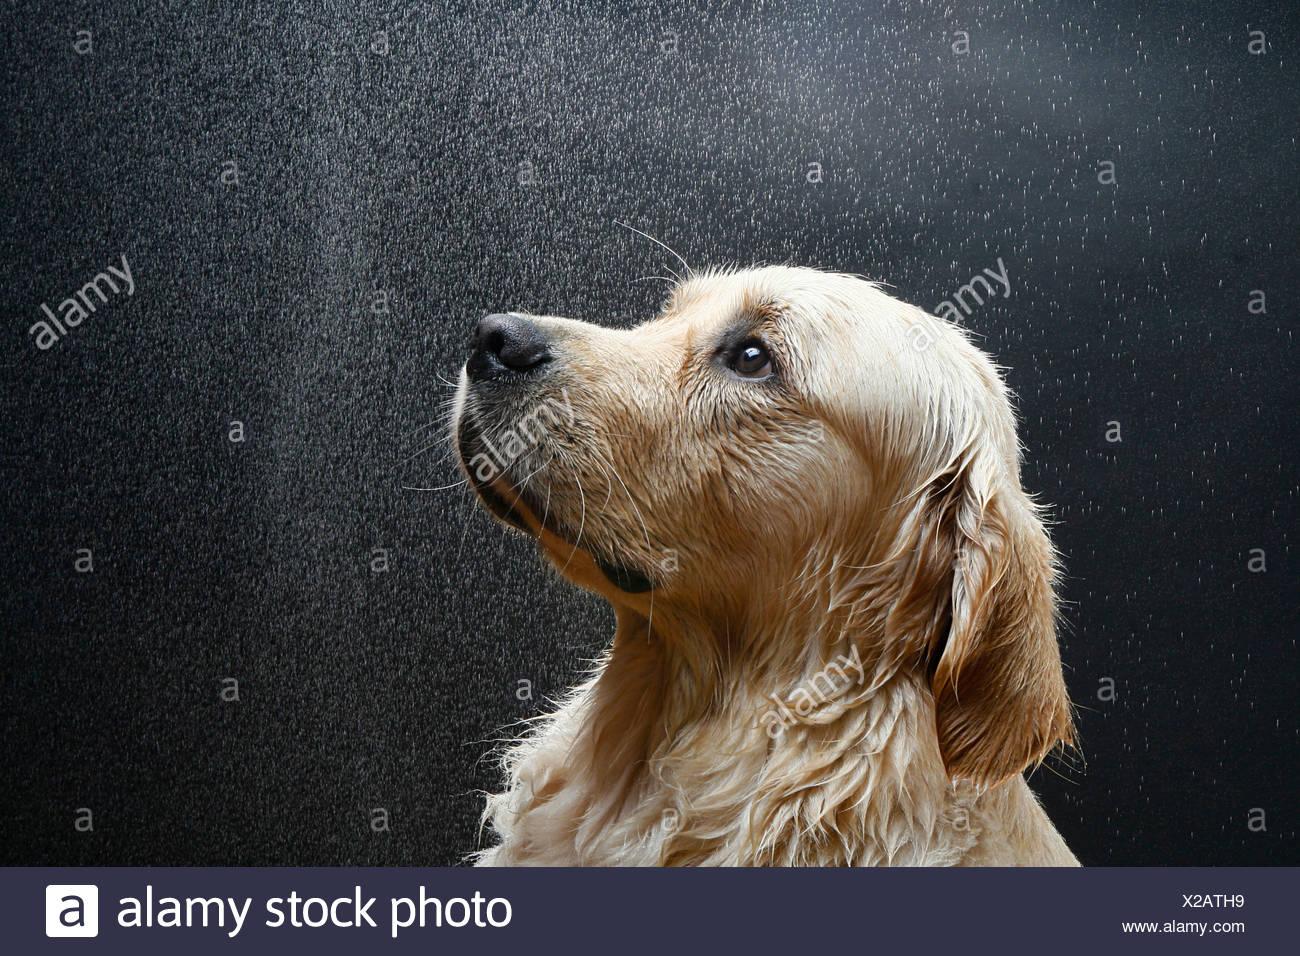 Golden Retriever - portrait Photo Stock